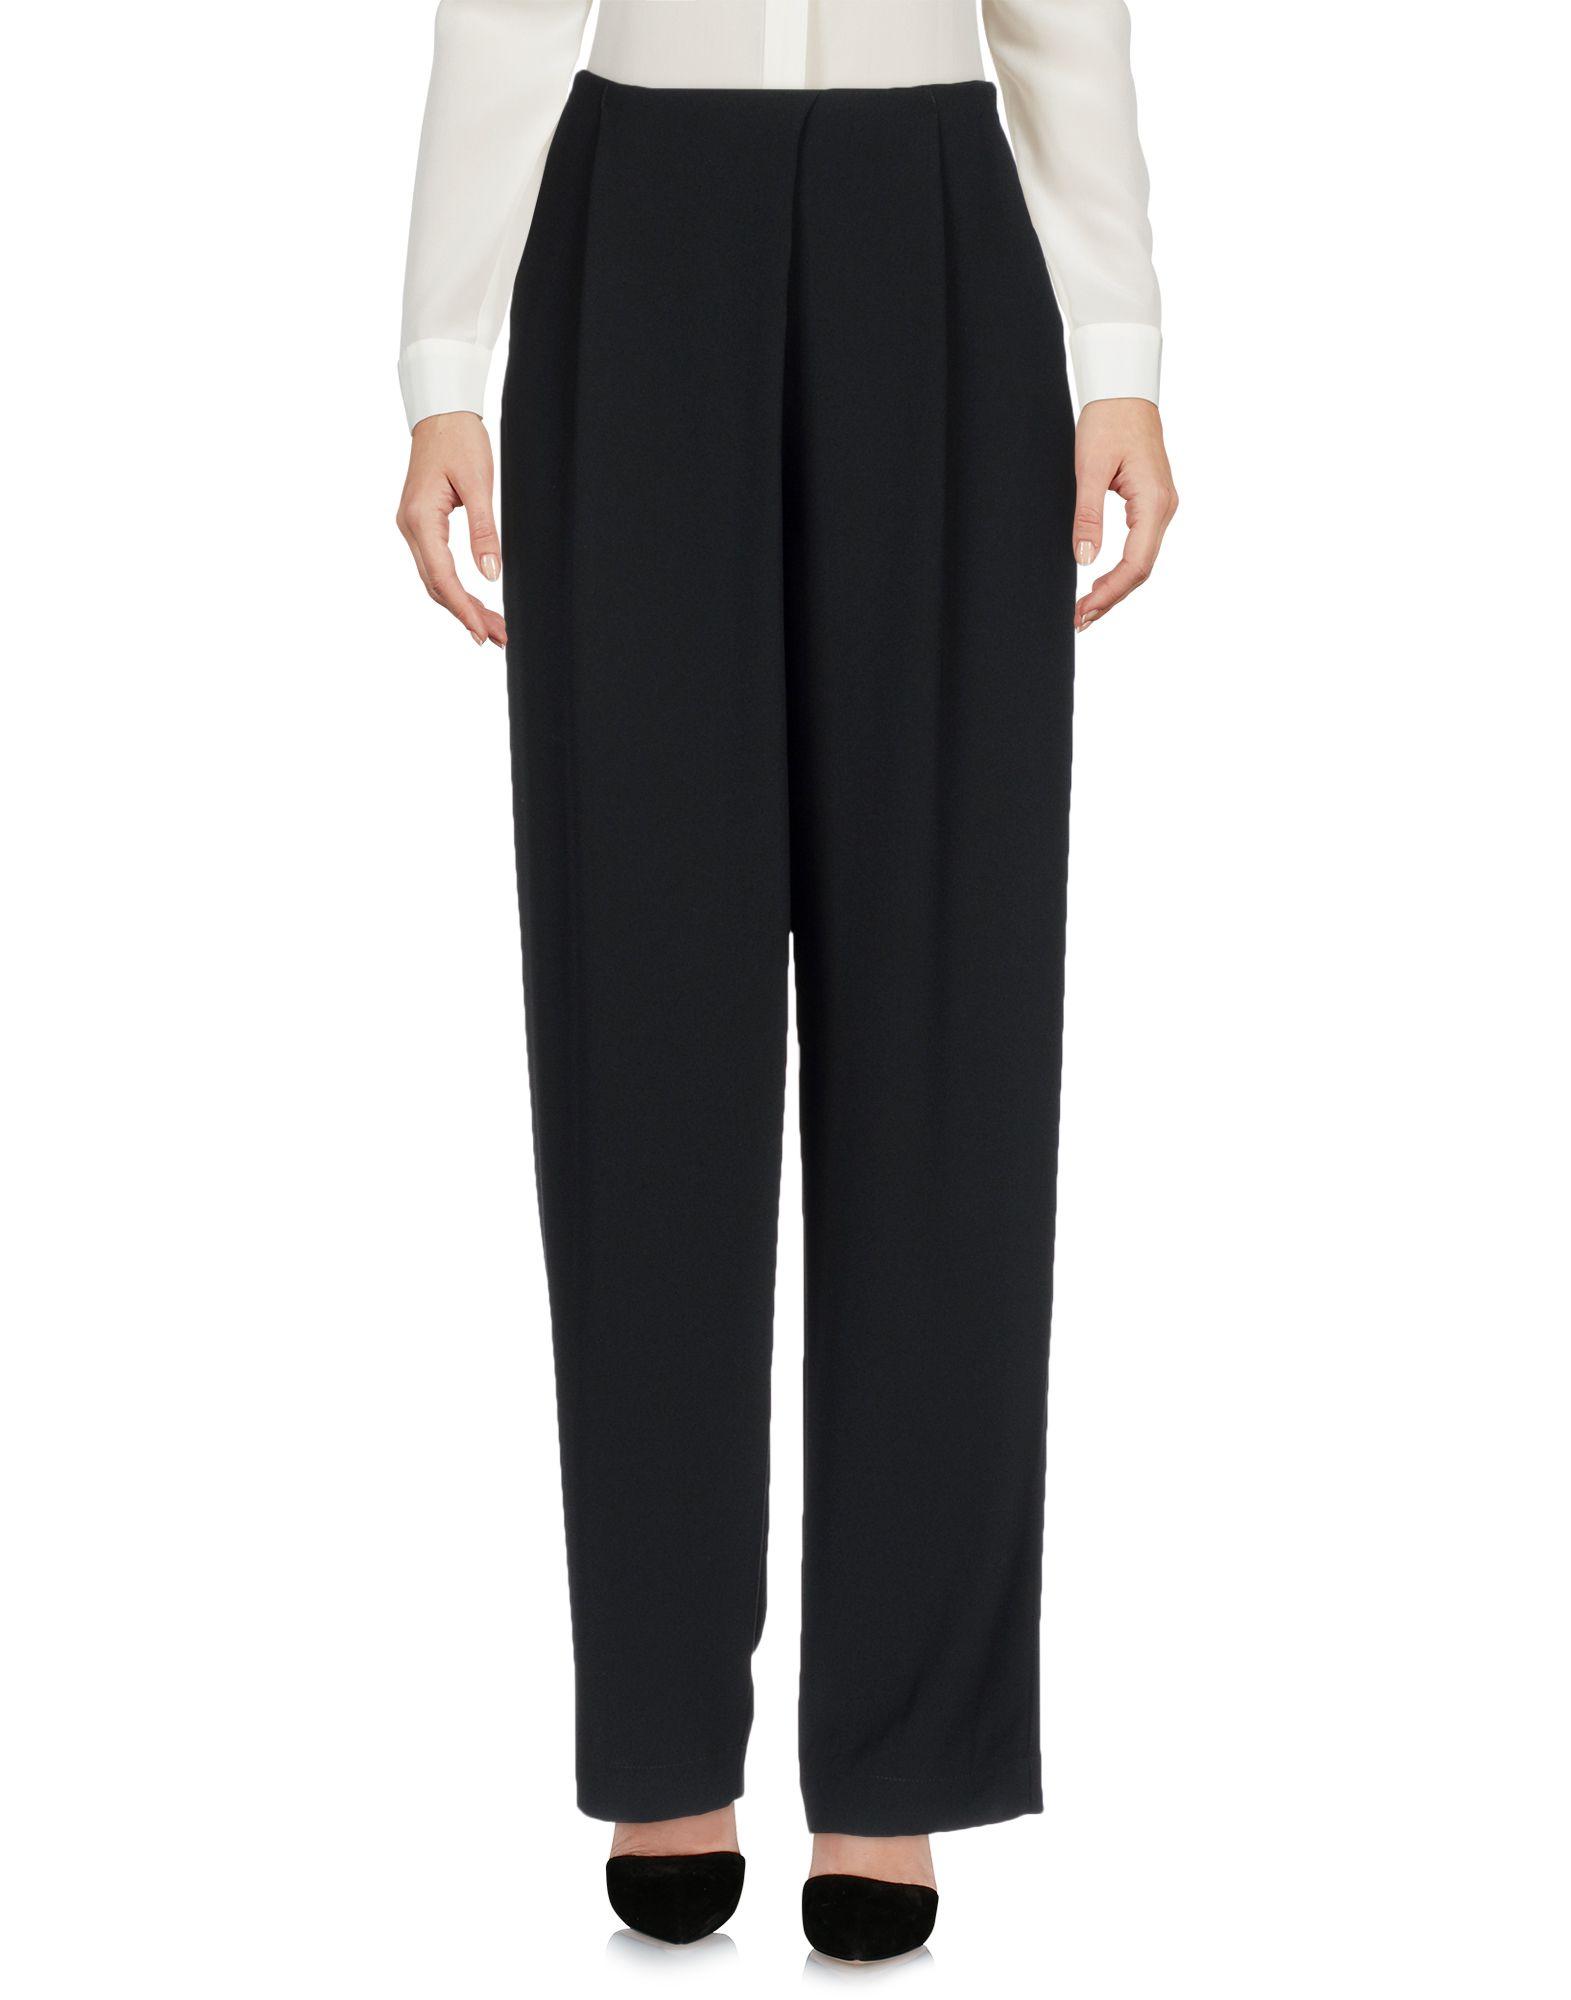 MALLONI Casual Pants in Black